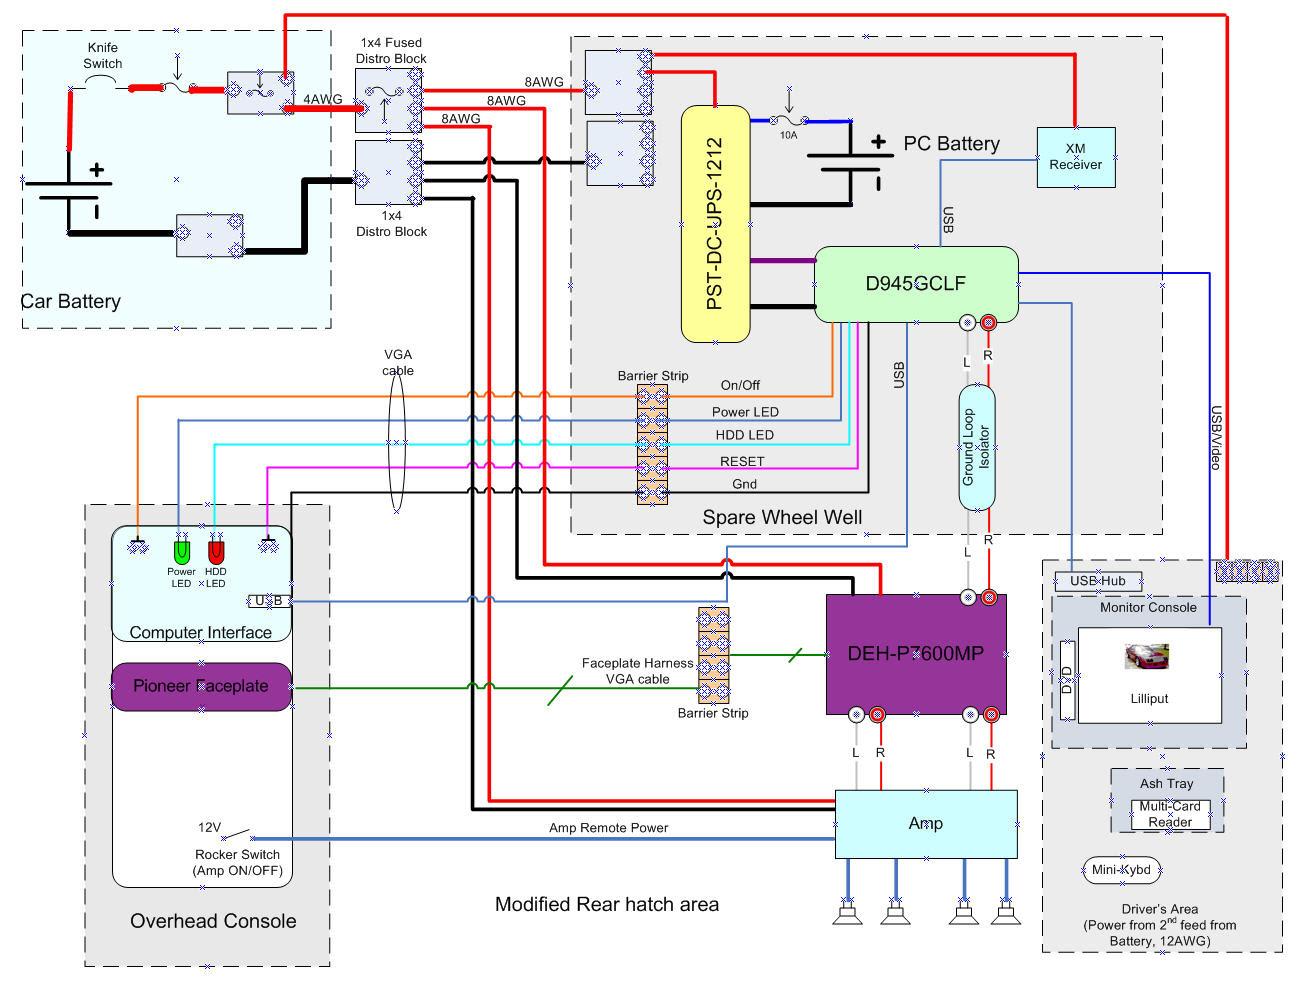 Diagram 1986 Iroc Wiring Diagram Schematic Full Version Hd Quality Diagram Schematic Iphoneunlocks Terrassement De Vita Fr